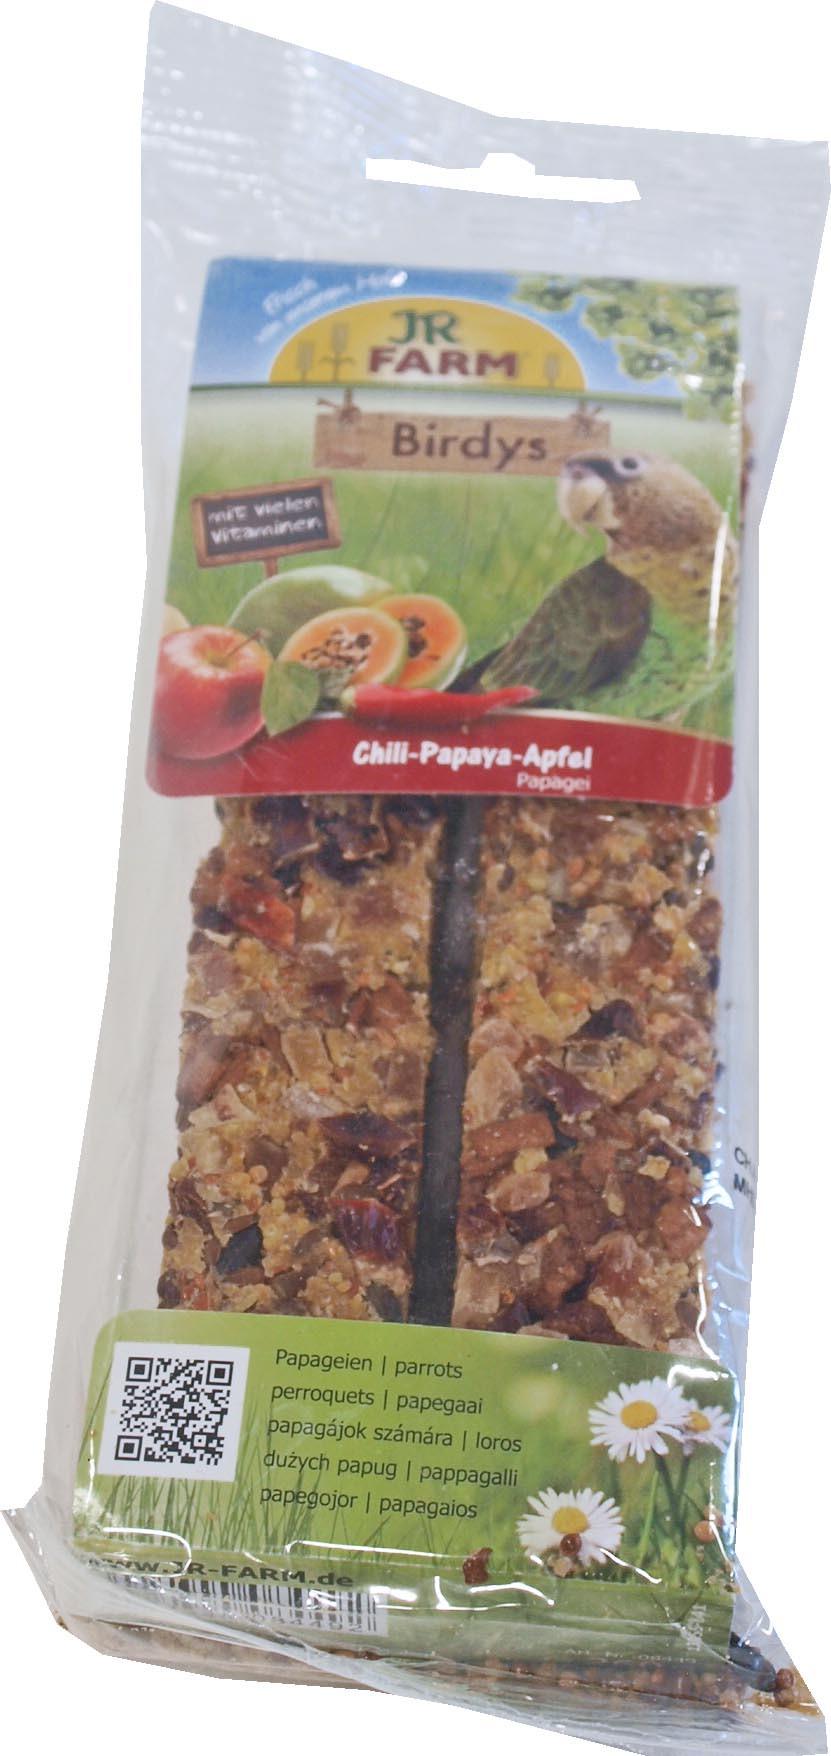 JR Farm Birdy papegaai chili/papaya/appel <br>260 gr